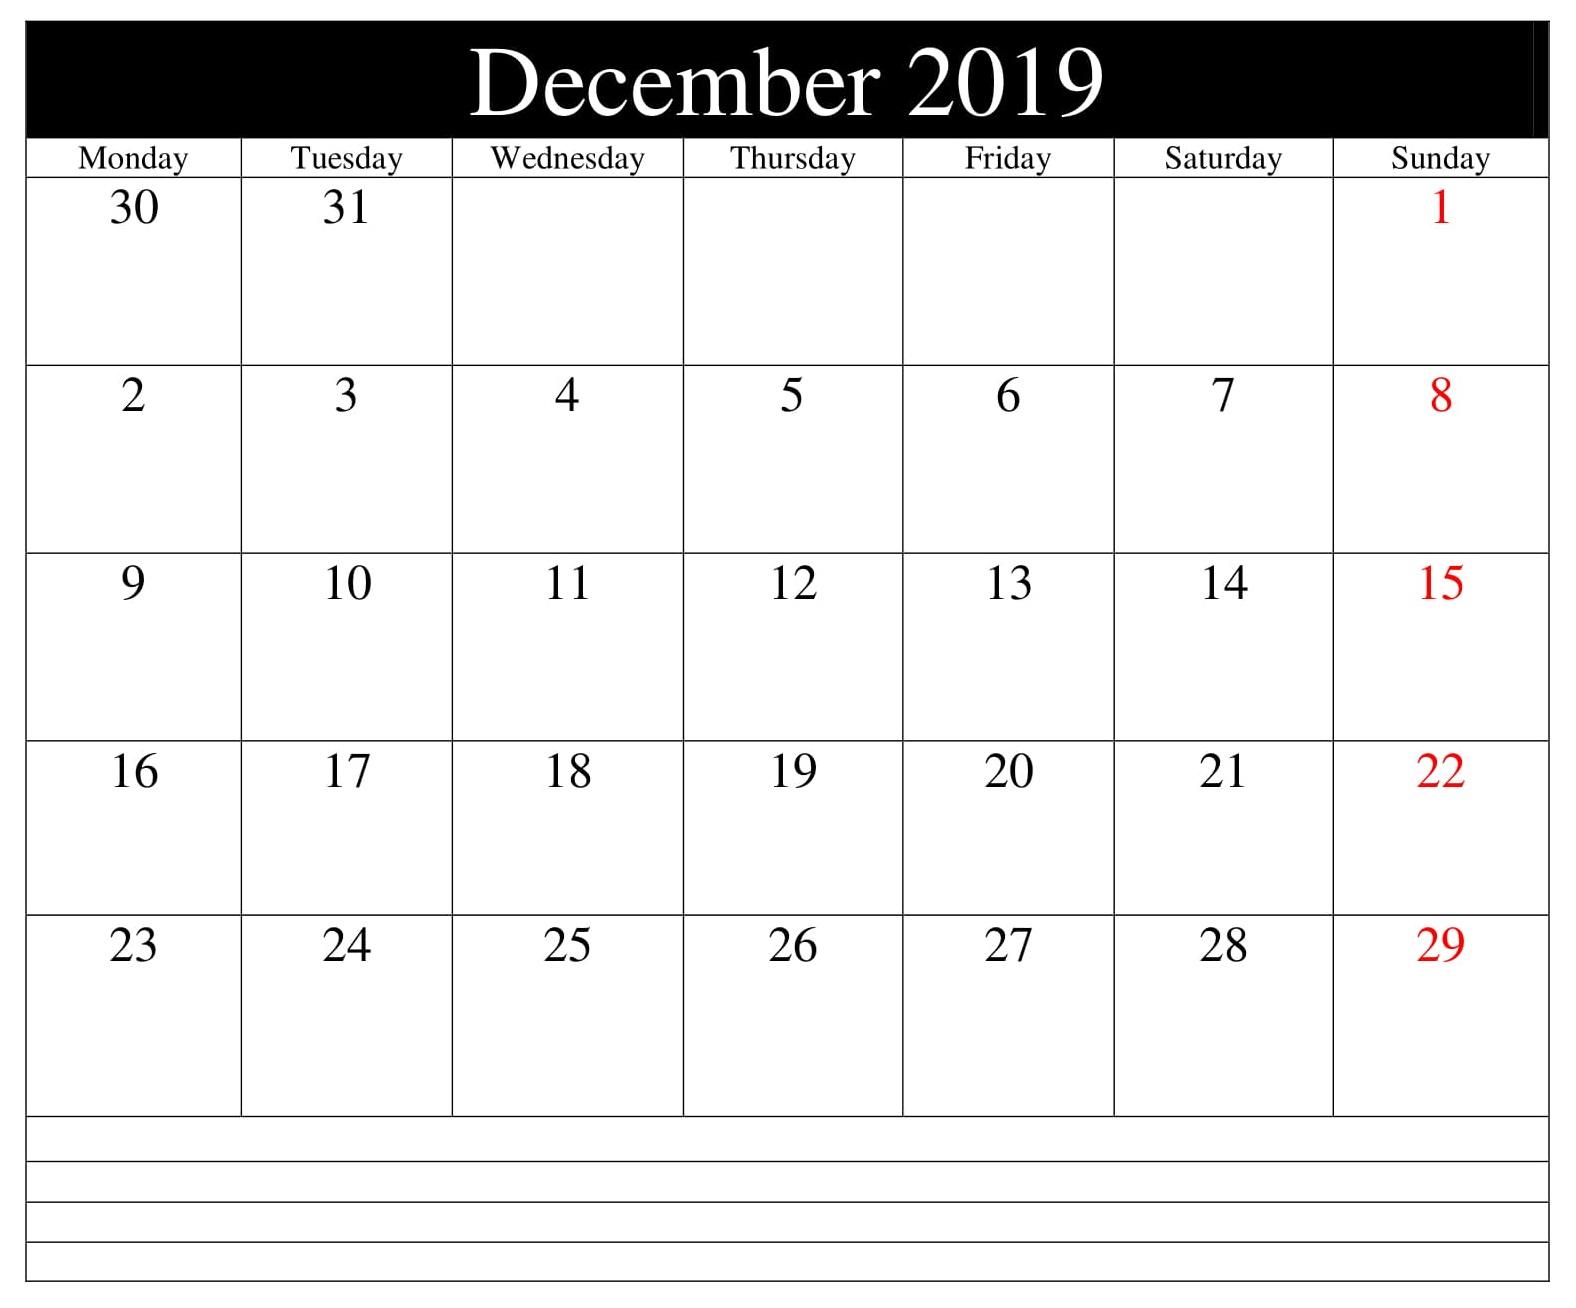 December 2019 Calendar Template Excel